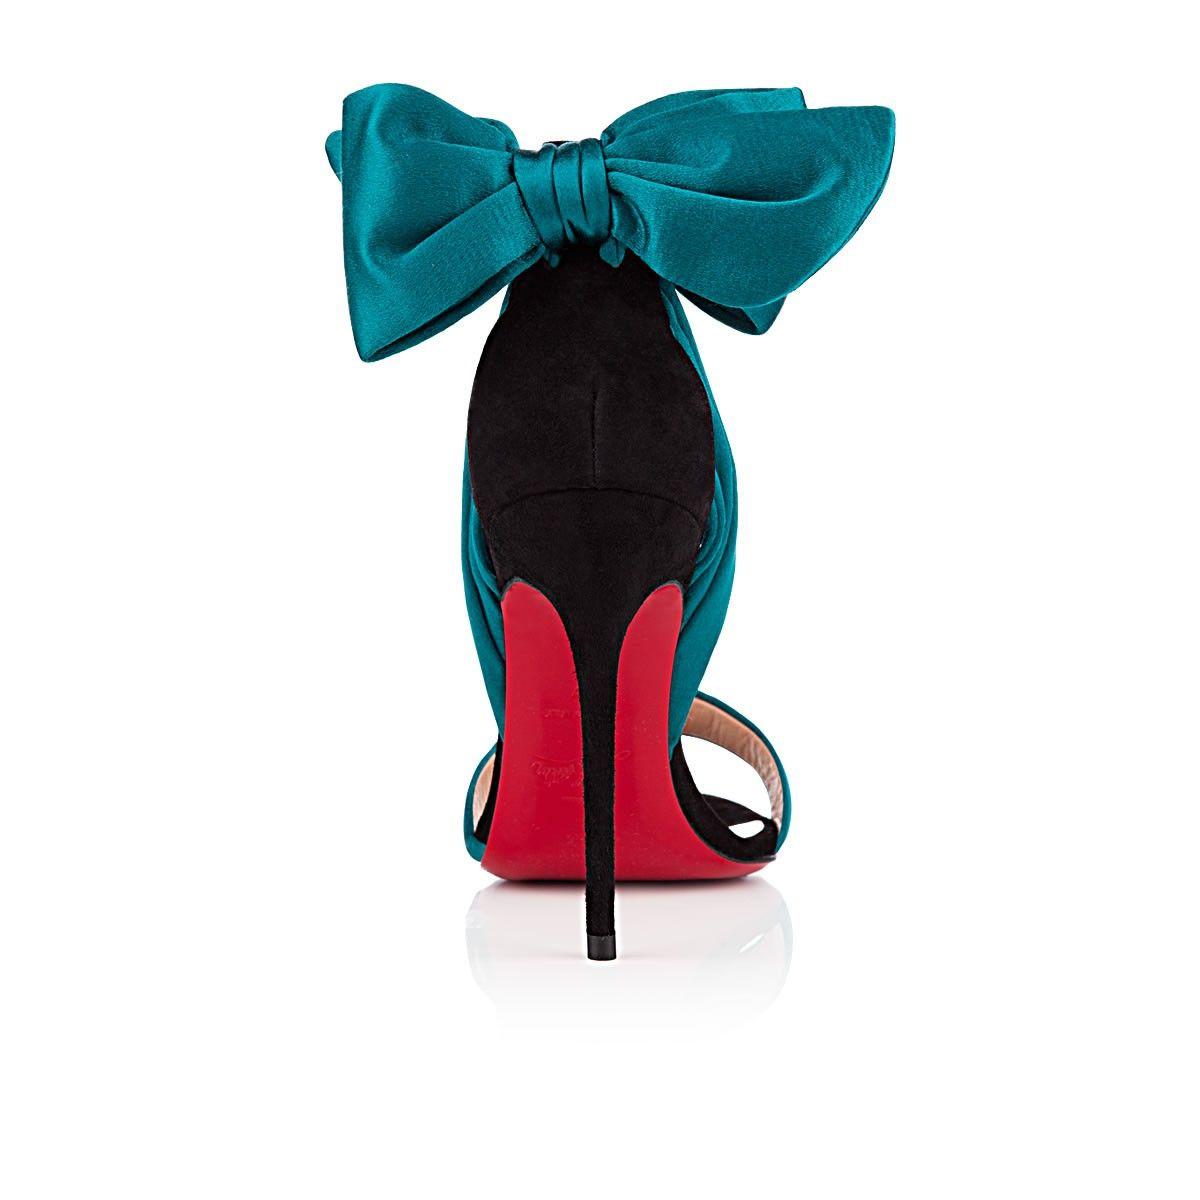 reputable site 3e516 eee8c wholesale louboutin vampanodo satin bow sandals